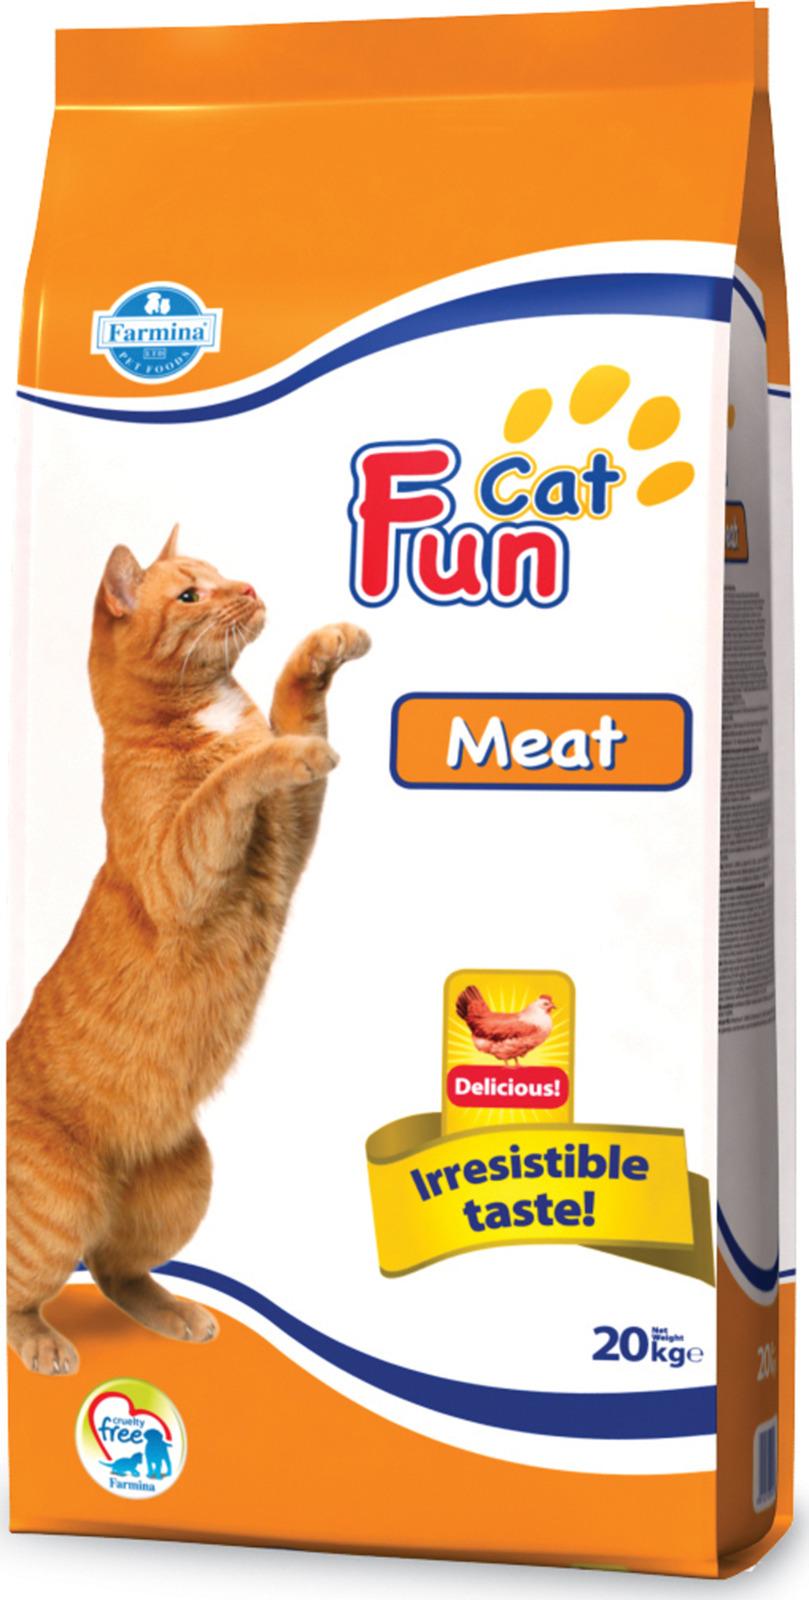 Корм сухой Farmina Fun Cat, для кошек, с мясом, 20 кг сухой корм farmina fun cat meat с мясом для взрослых кошек 20кг 10476